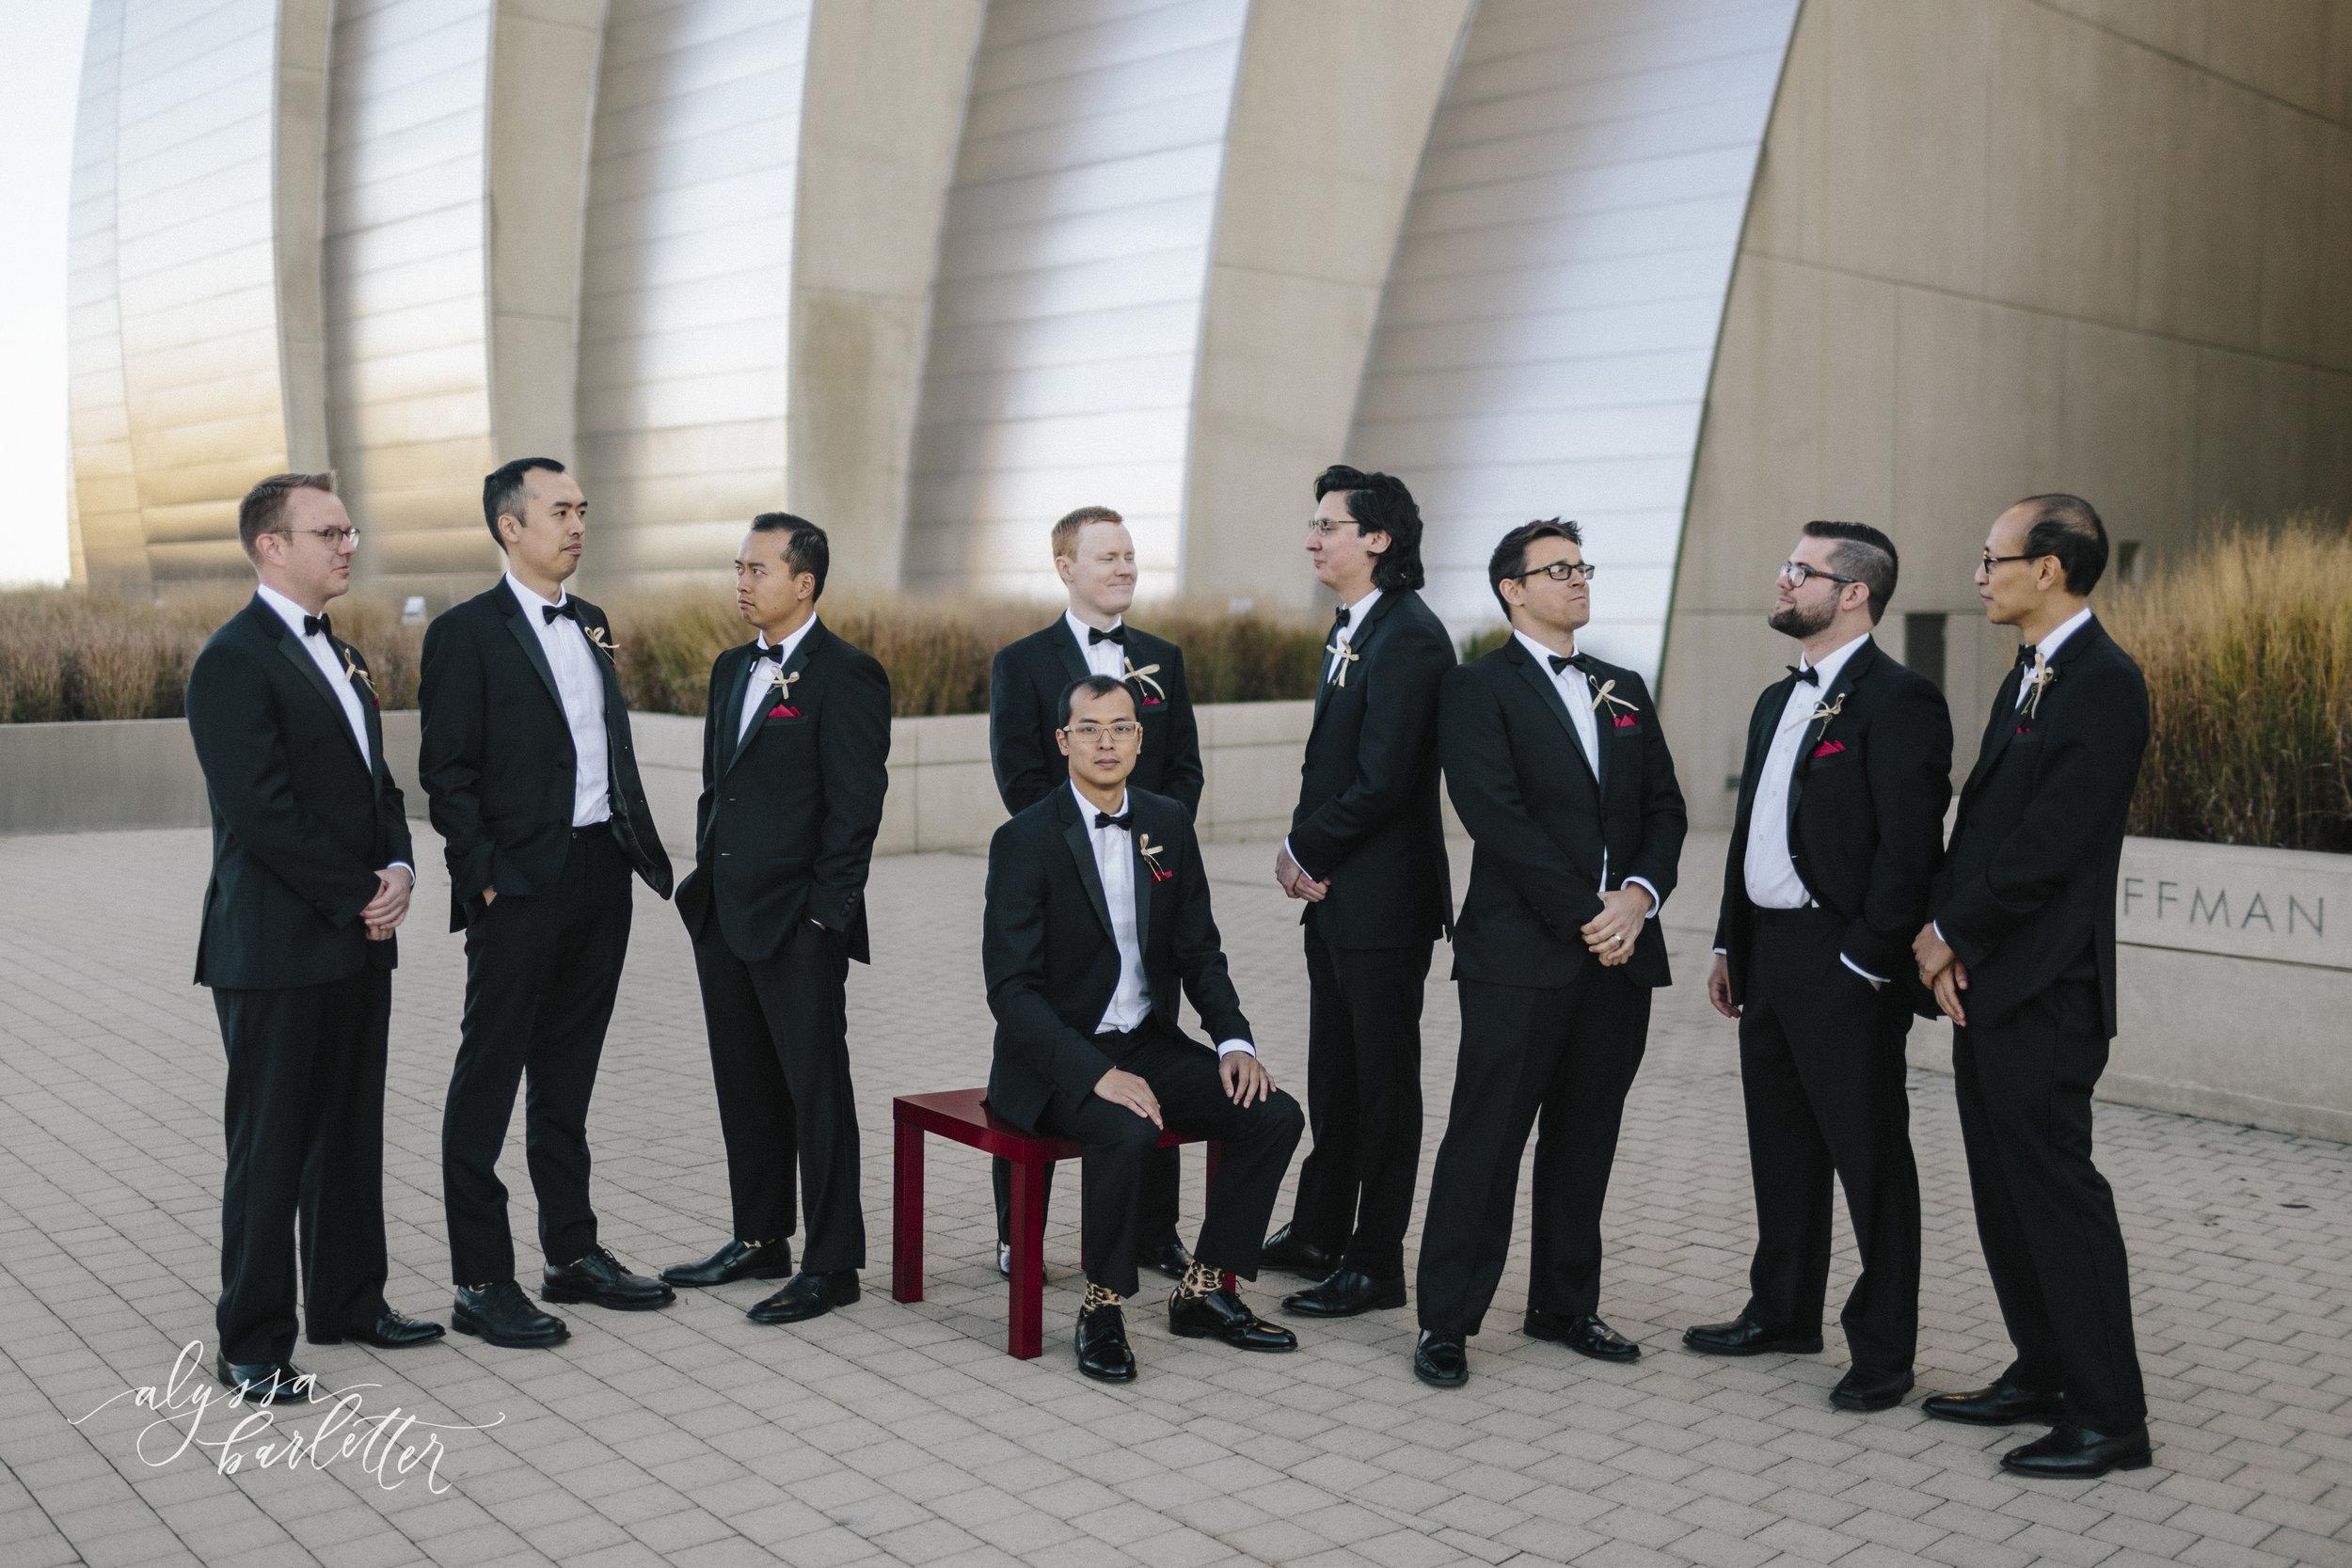 alyssa barletter photography union station wedding photos leopard print winter wedding-1-27.jpg